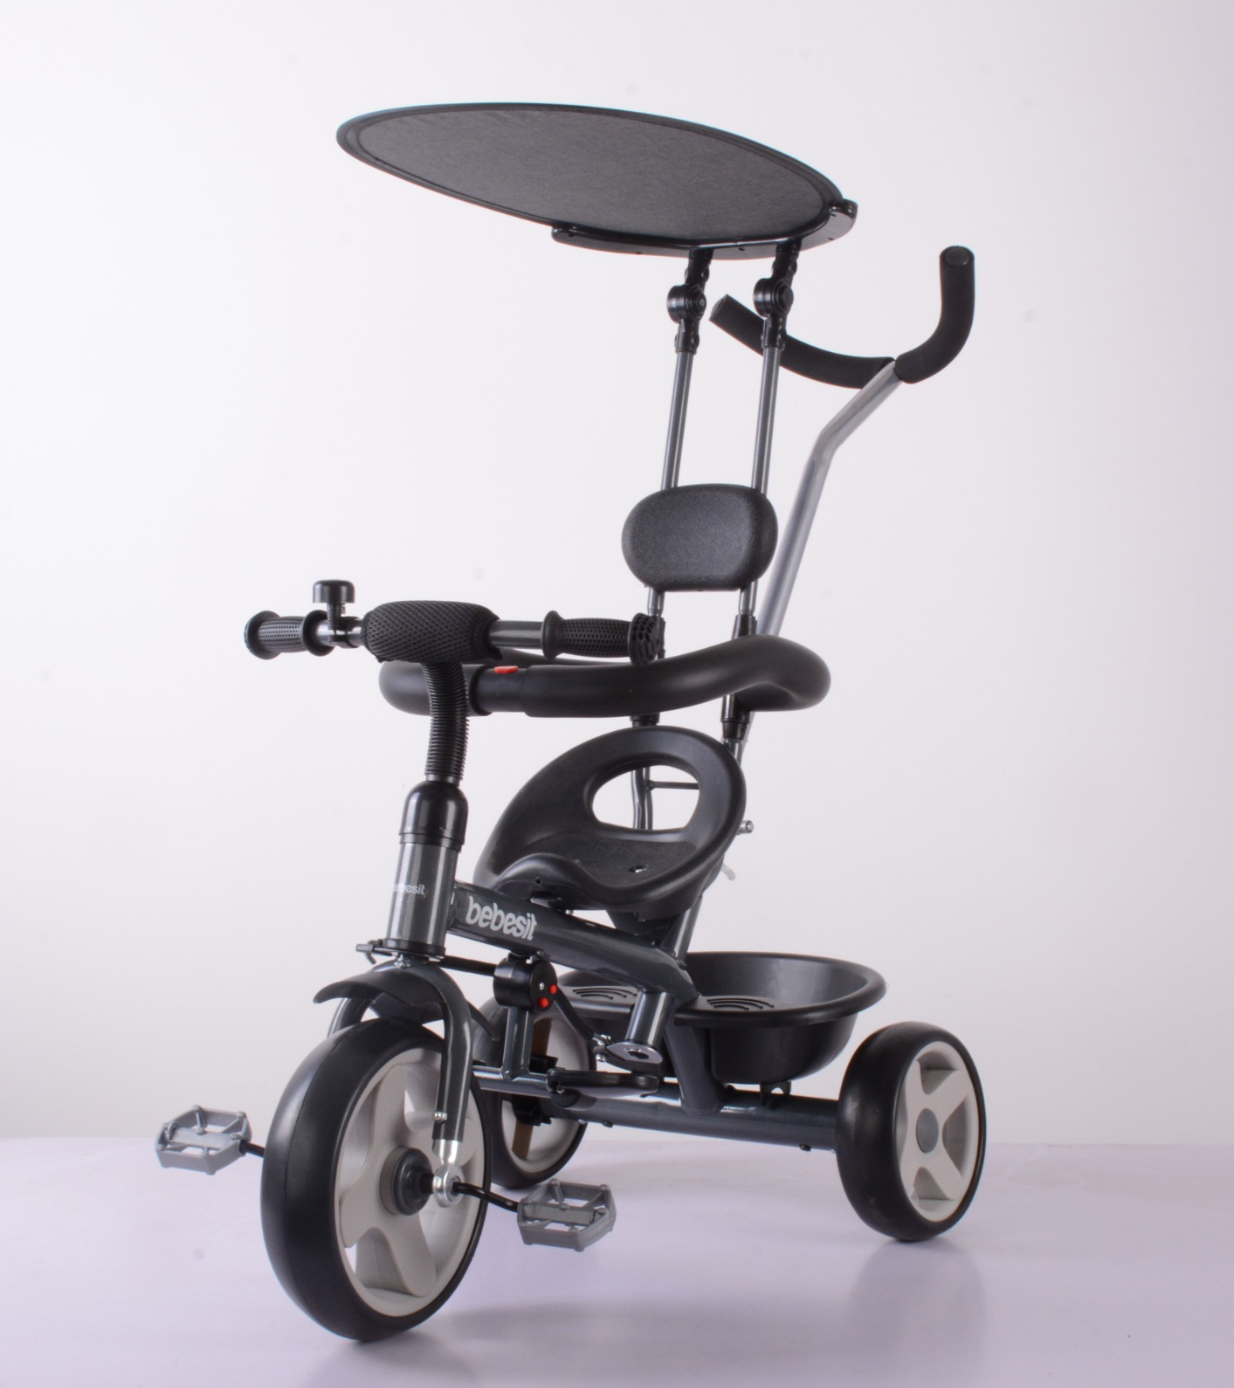 BEBESIT Triciclo con Capota Gris